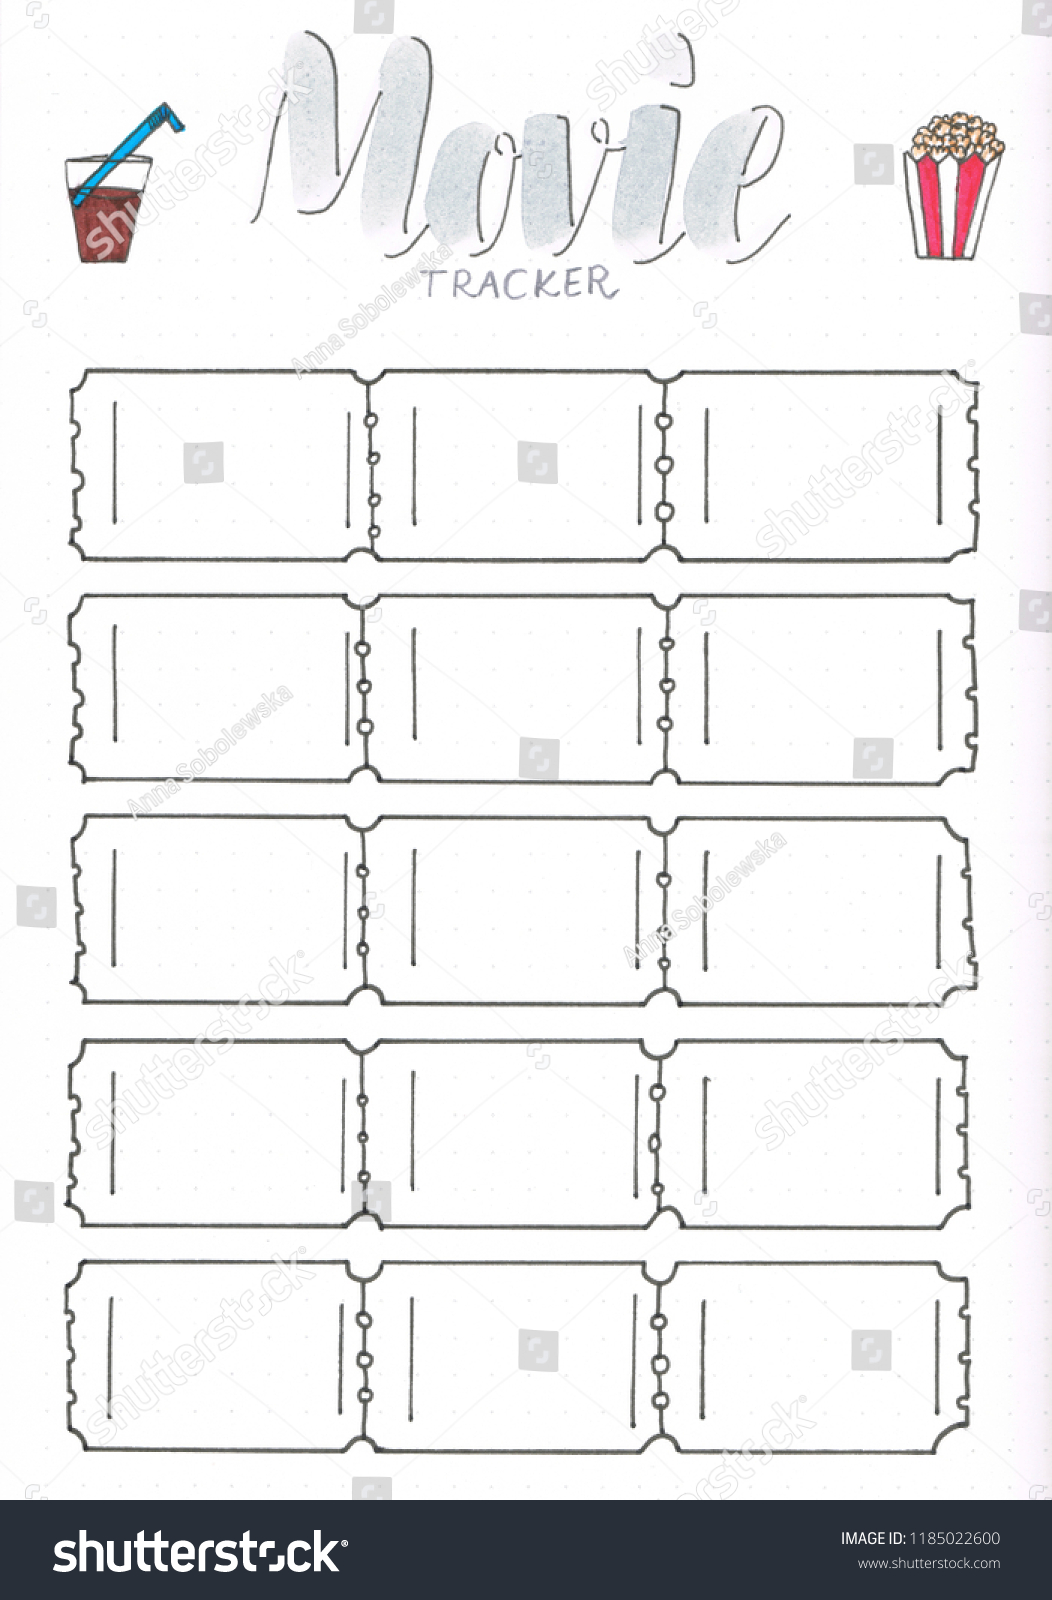 Royalty Free Stock Illustration Of Movie Tracker Bullet Journal